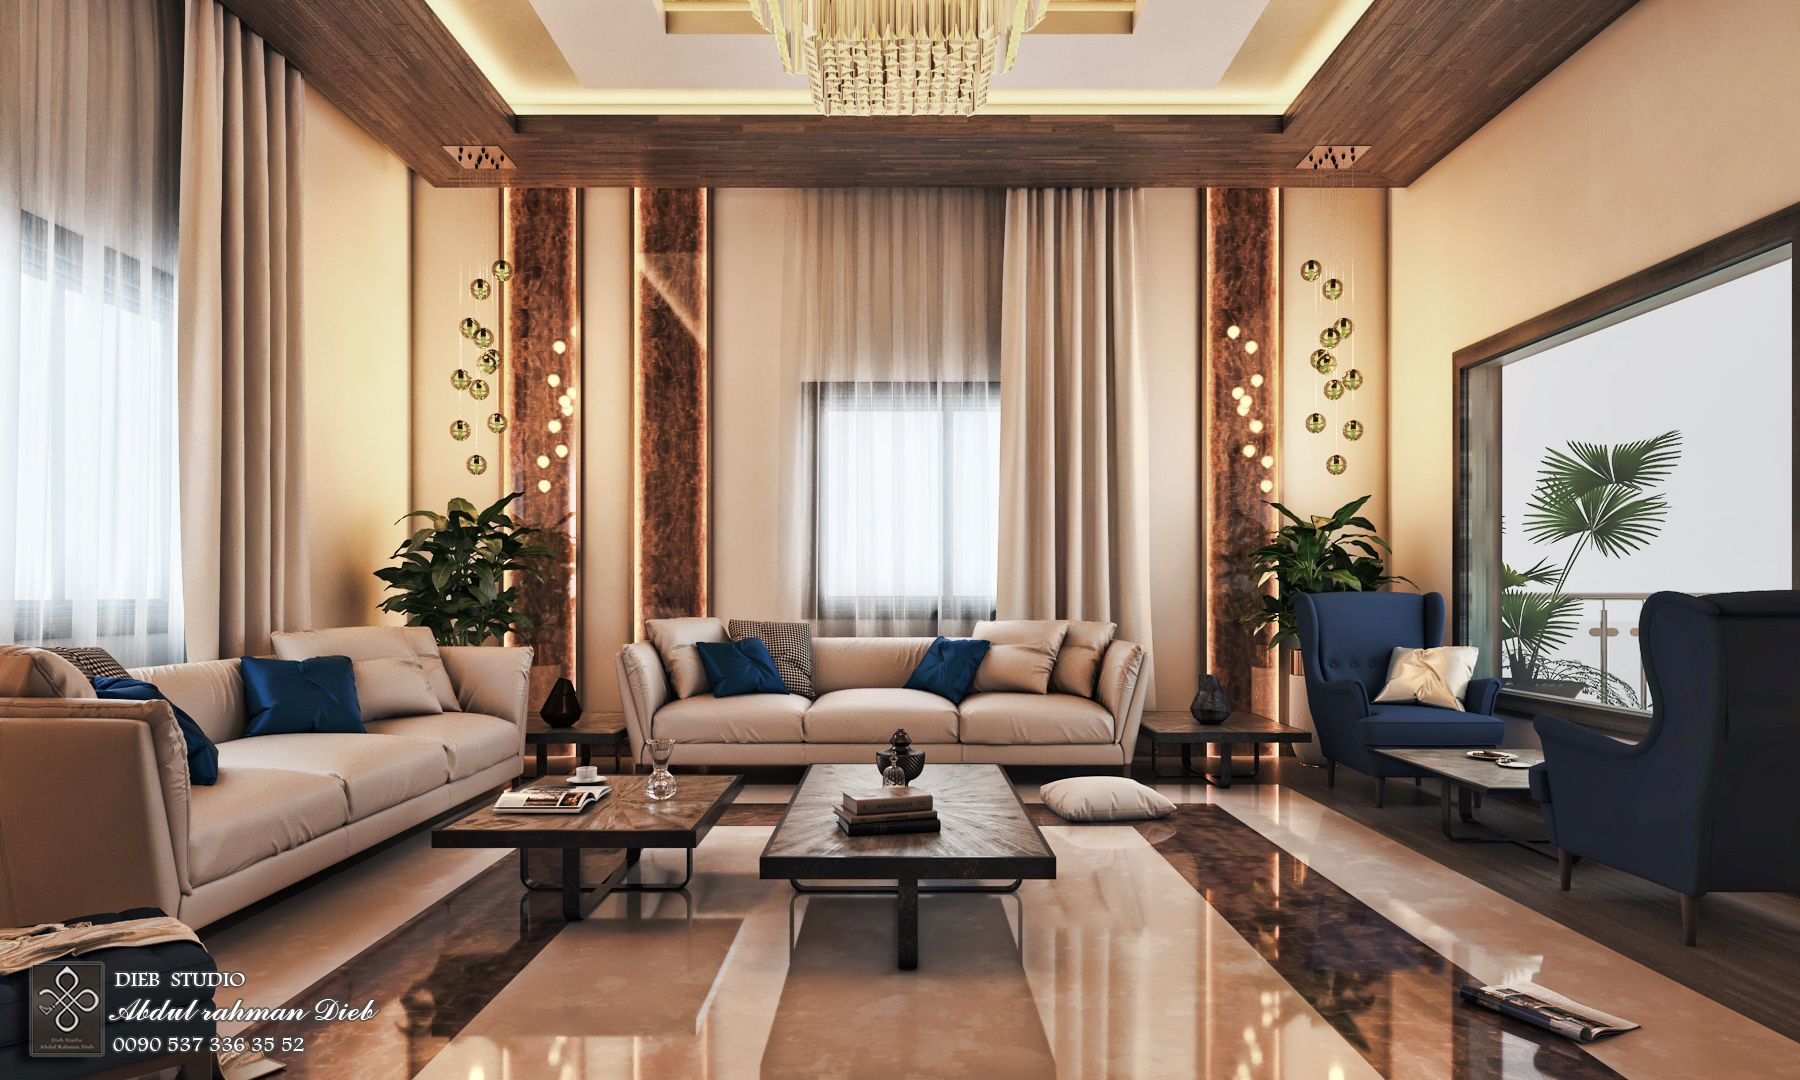 Home Interior Architecture Design Drawing Room Design